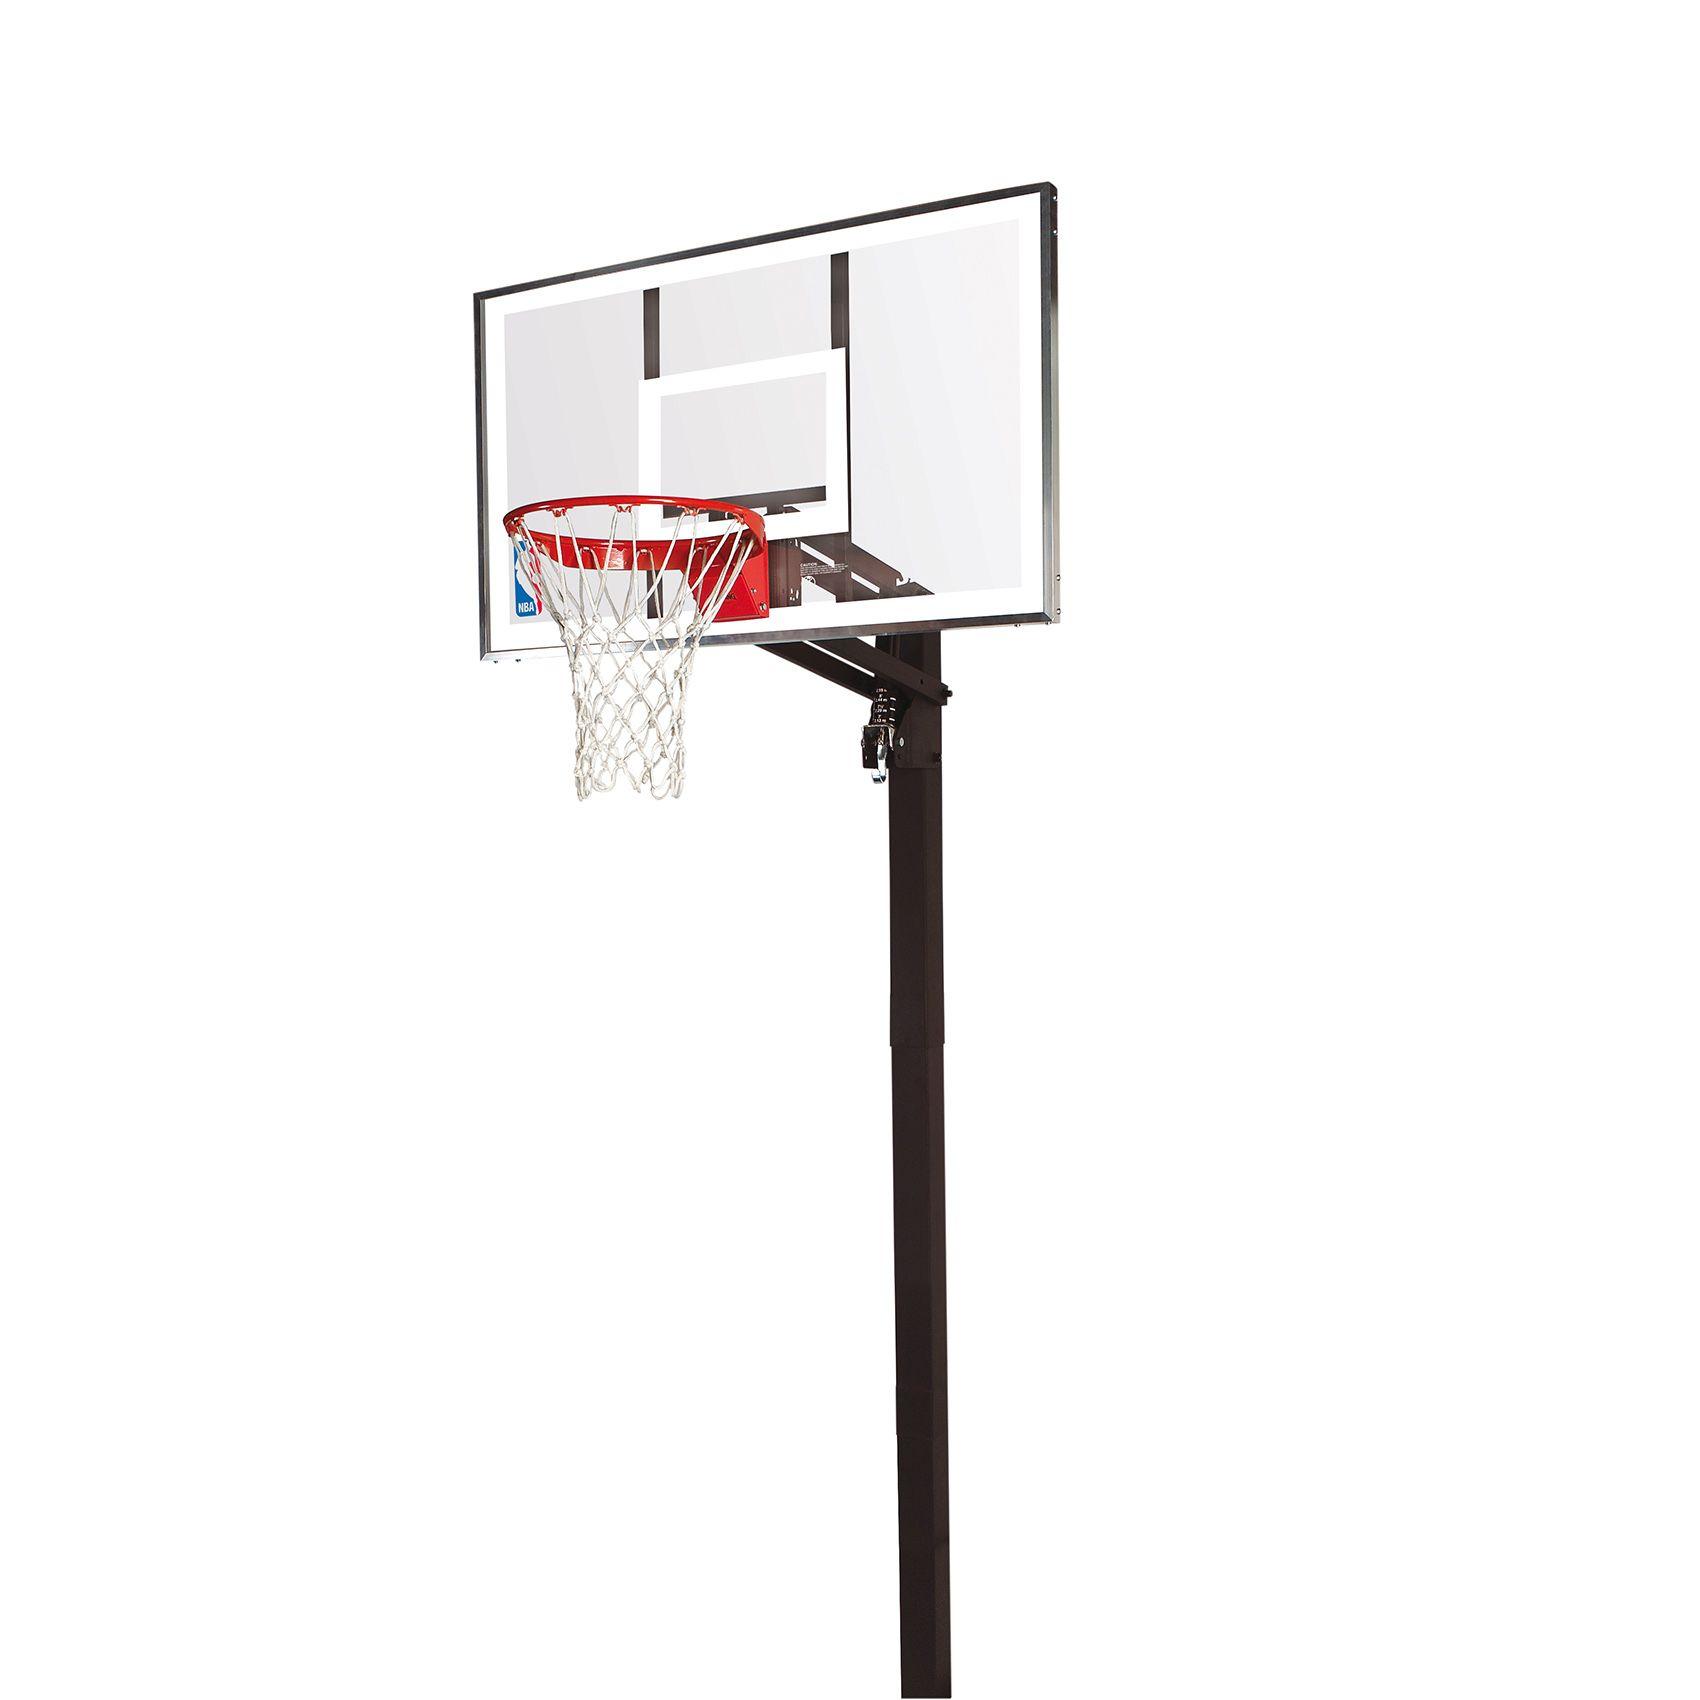 Spalding NBA Gold In Ground Basketball Hoop - Sweatband.com